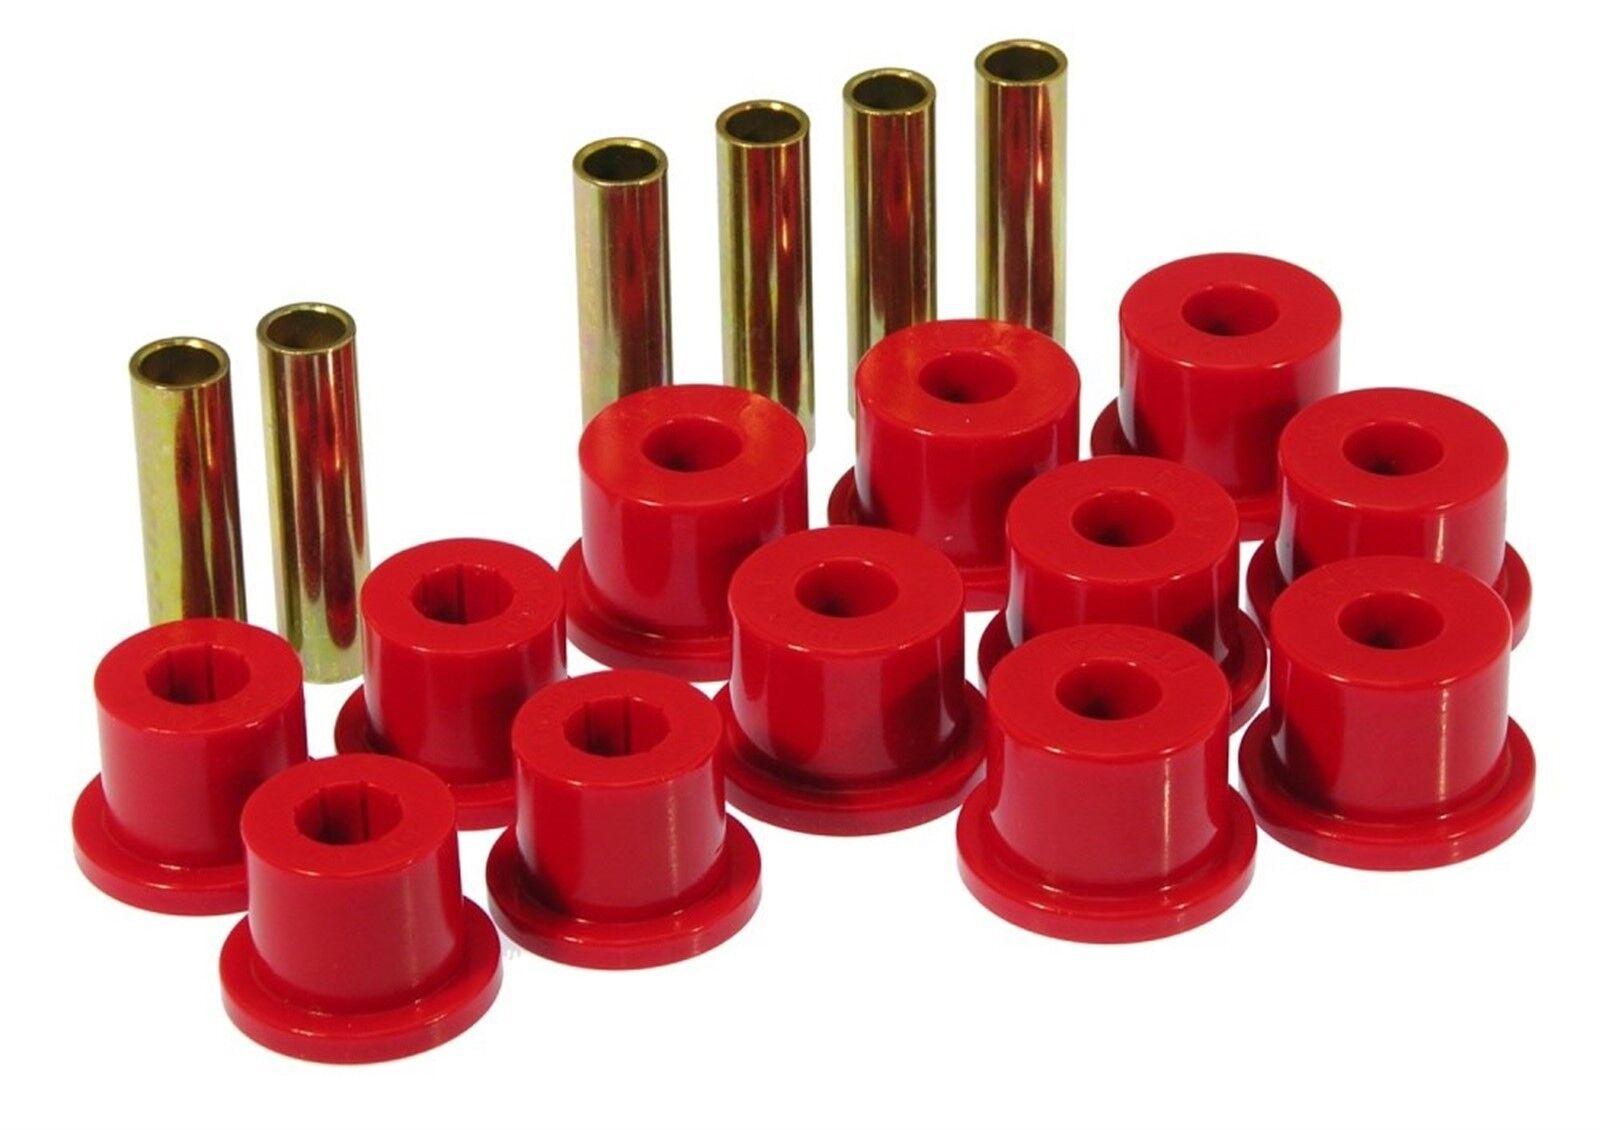 Prothane 4-1008 Red Rear Spring Eye and Shackle Bushing Kit